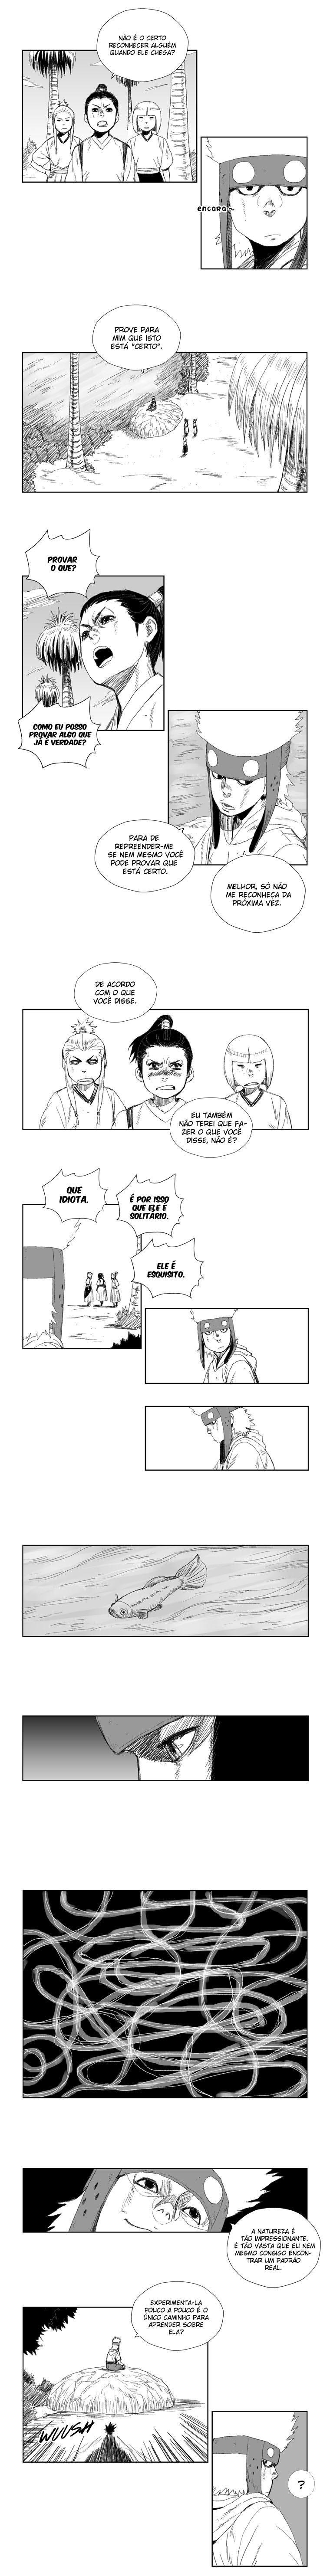 https://nine.mangadogs.com/br_manga/pic/29/1501/616314/RedStorm023399.jpg Page 3